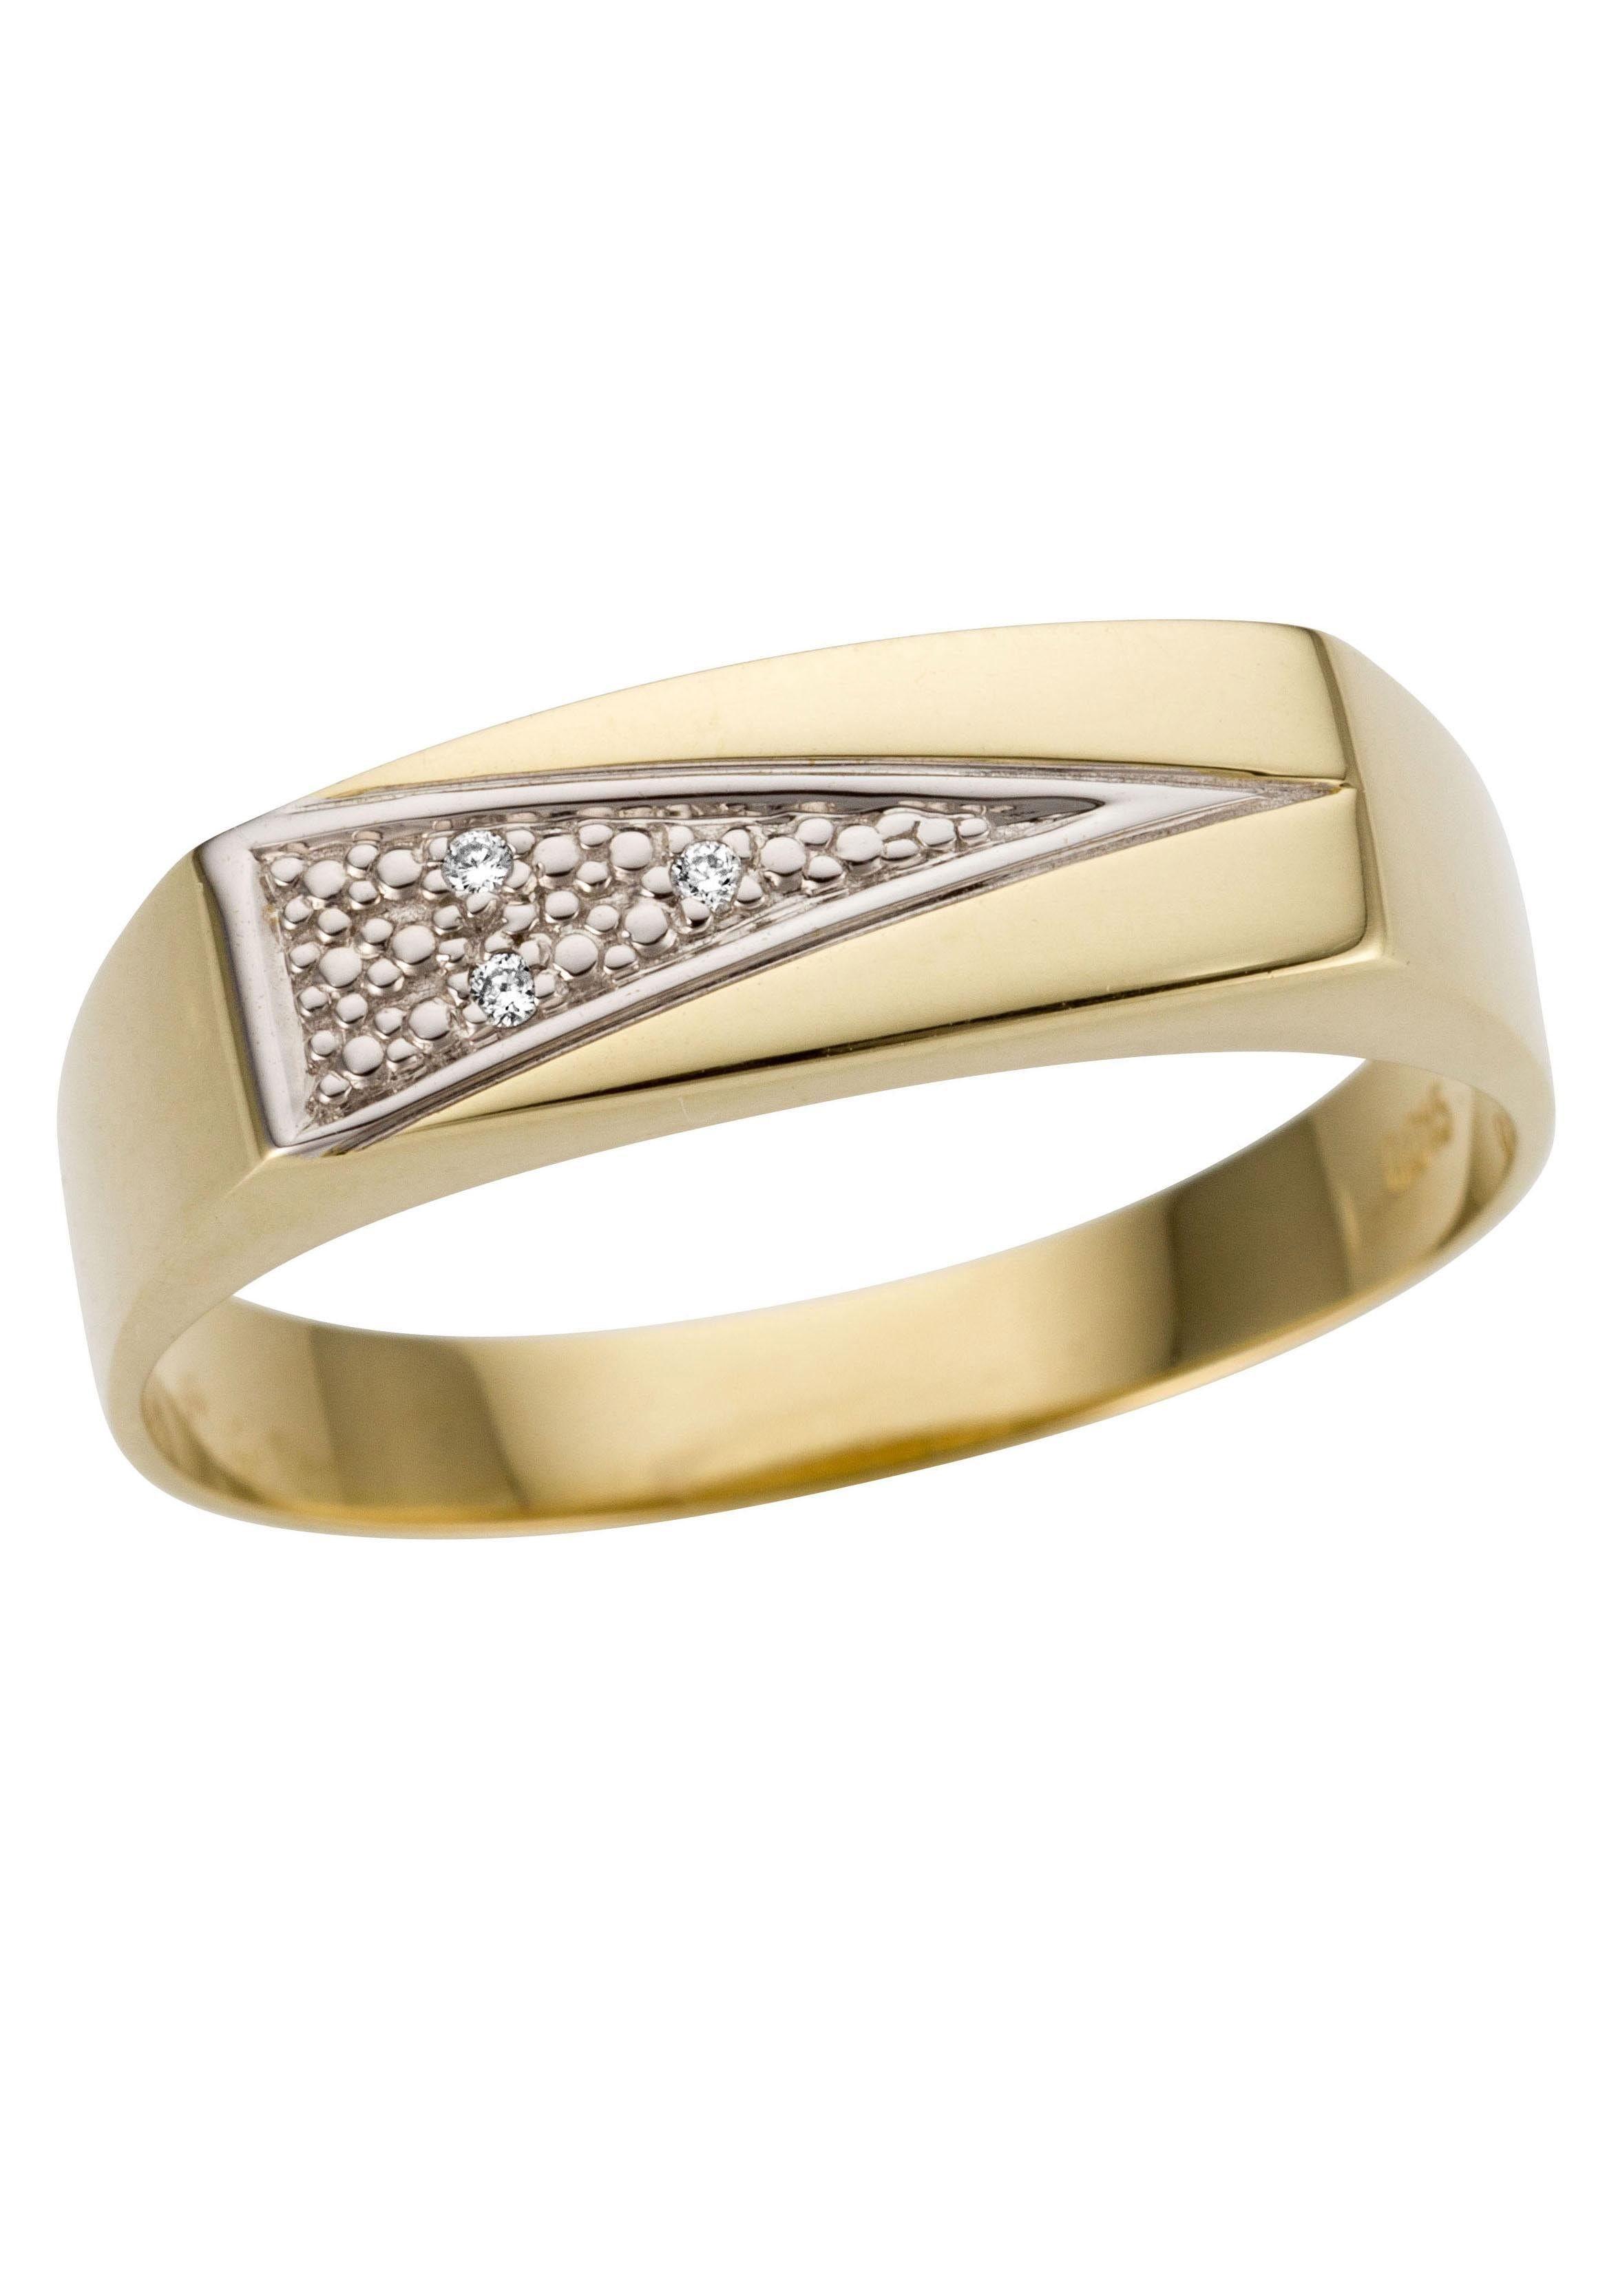 Firetti Goldring Siegelring,bicolor, glanz, rhodinierte Fassung, massiv, dreieckig | Schmuck | Firetti